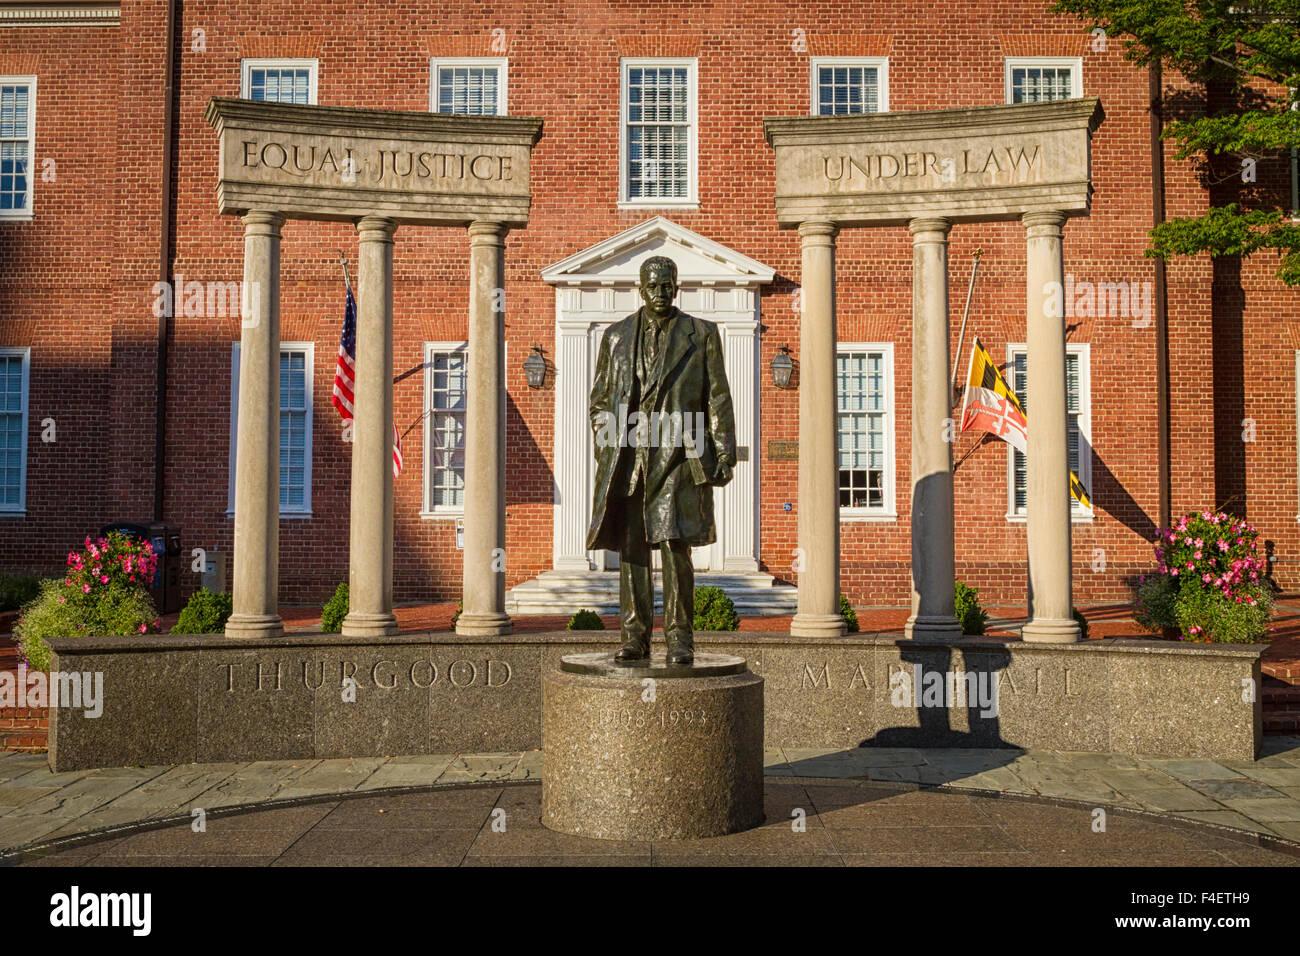 USA, Maryland, Annapolis. Thurgood Marshall Memorial Statue. - Stock Image